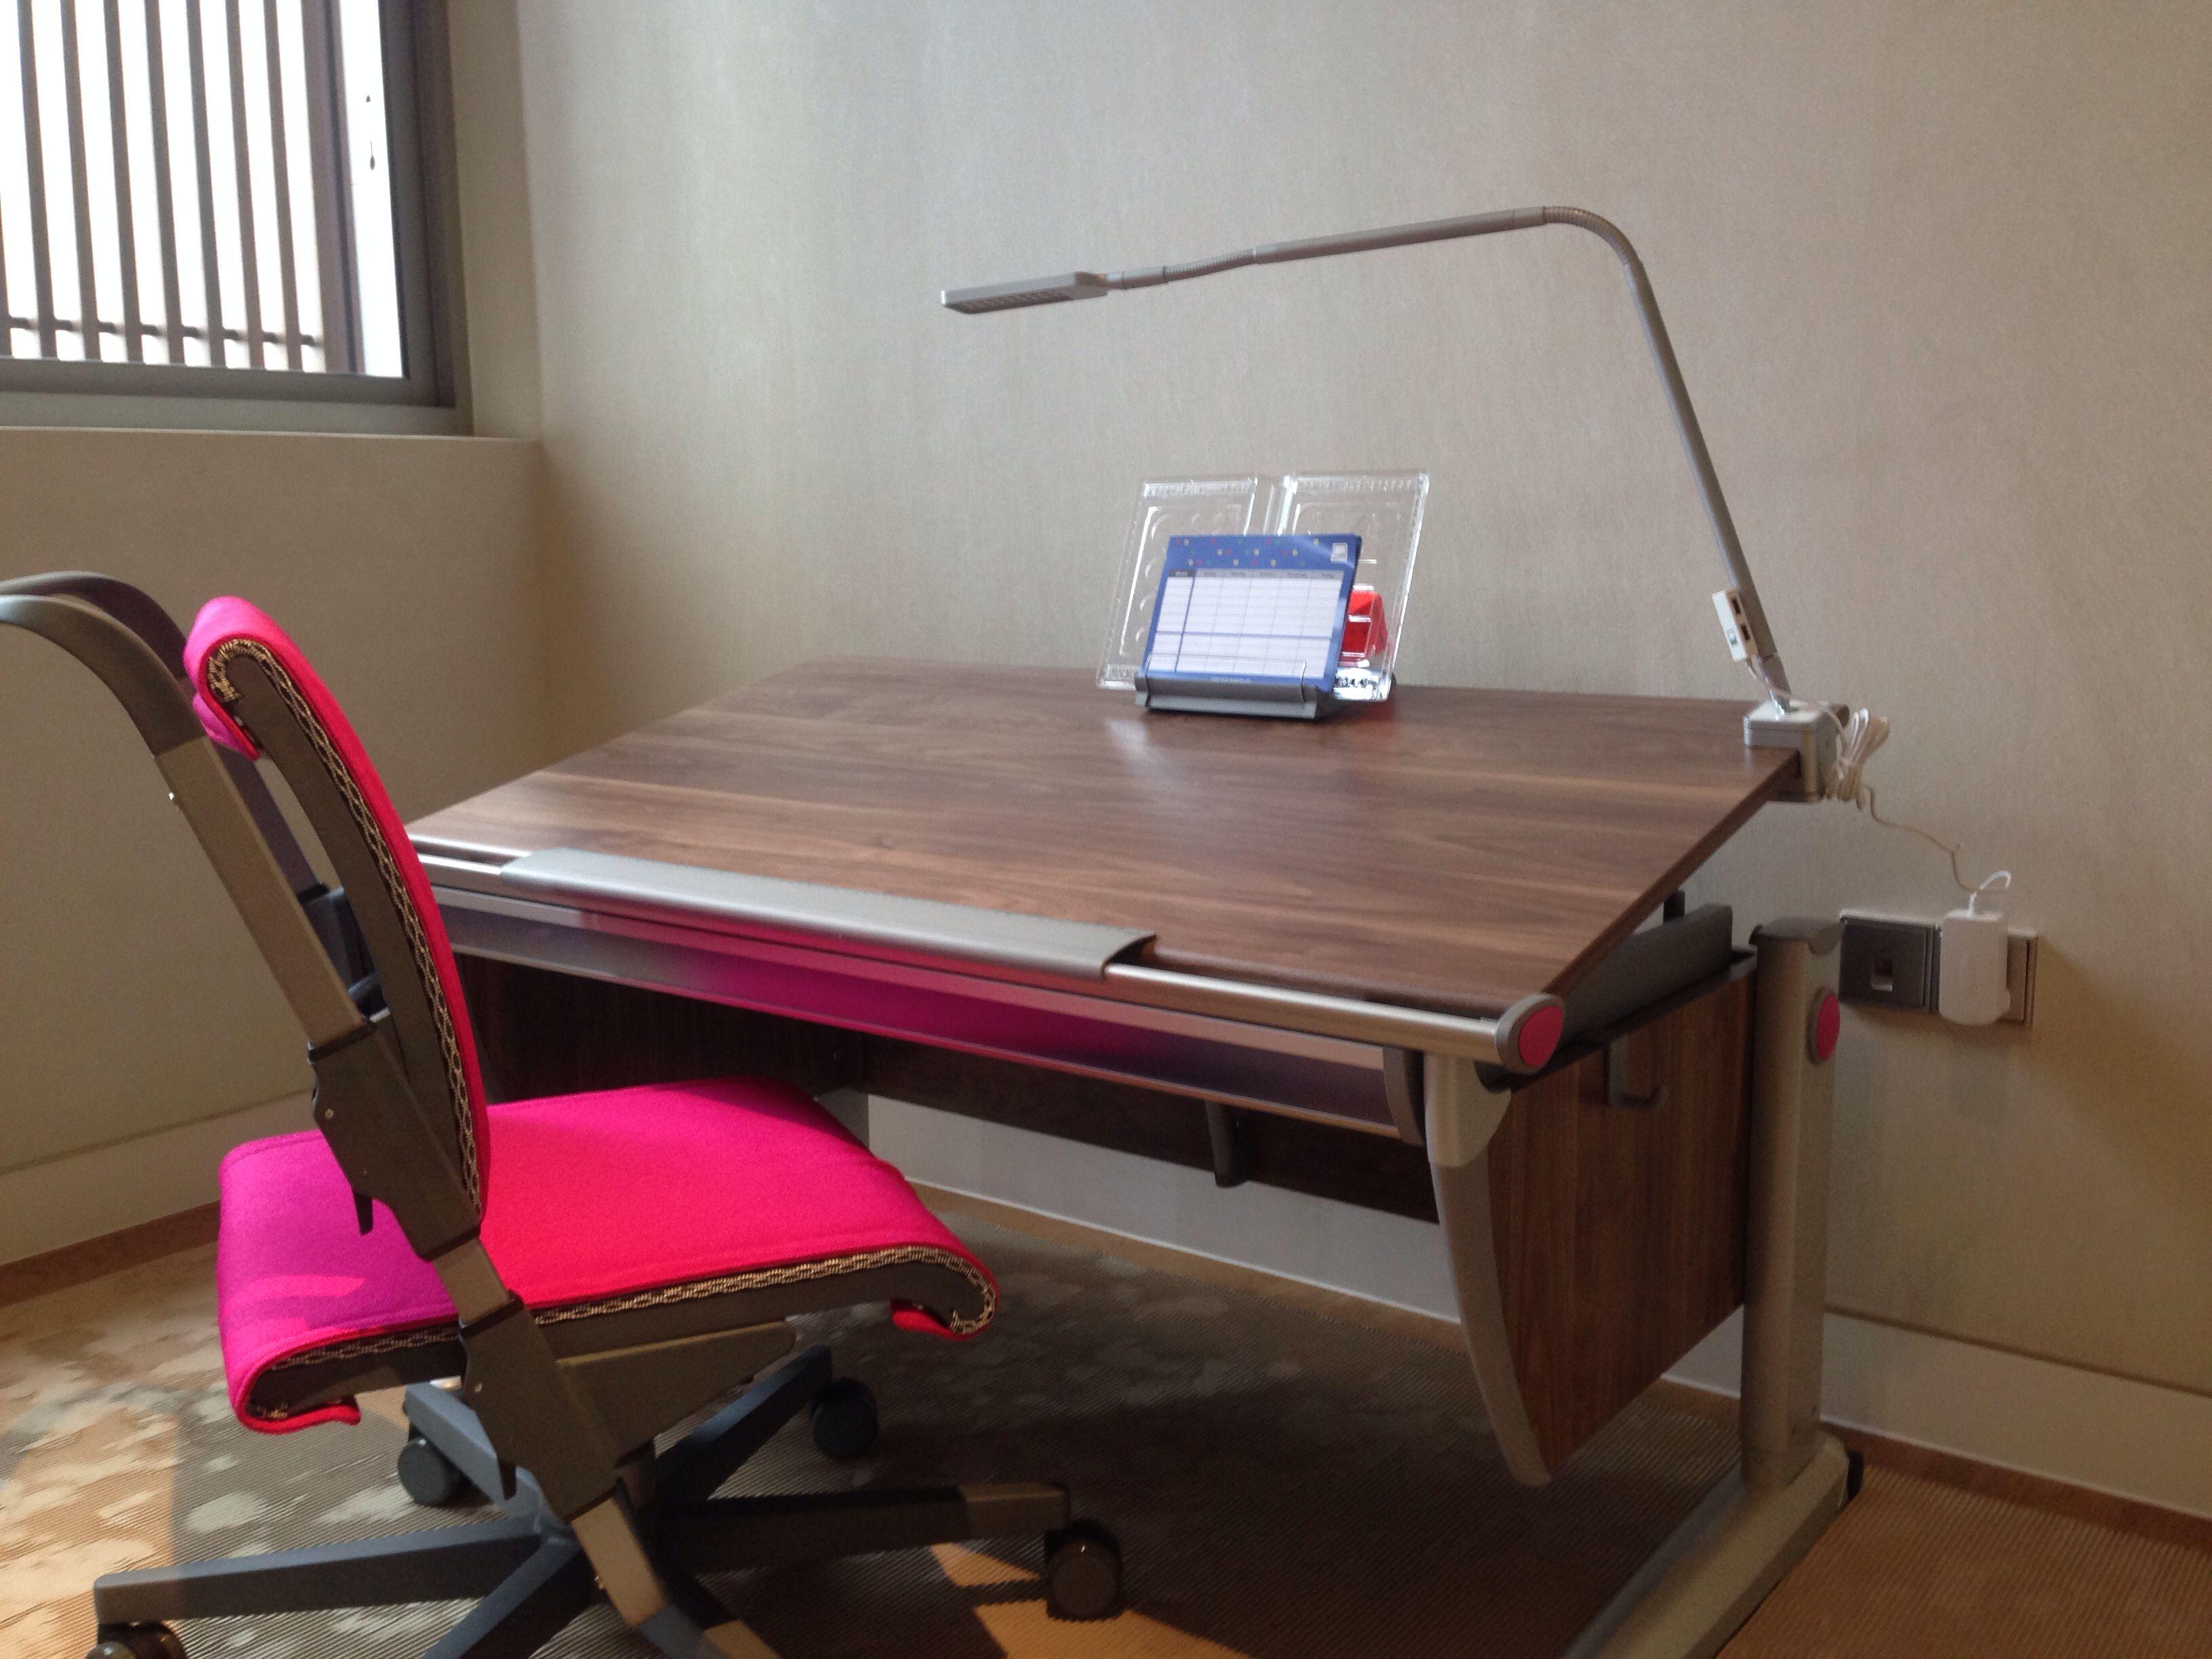 Moll Desks Runner Desk Scooter Chair Kids Ergonomic Desks